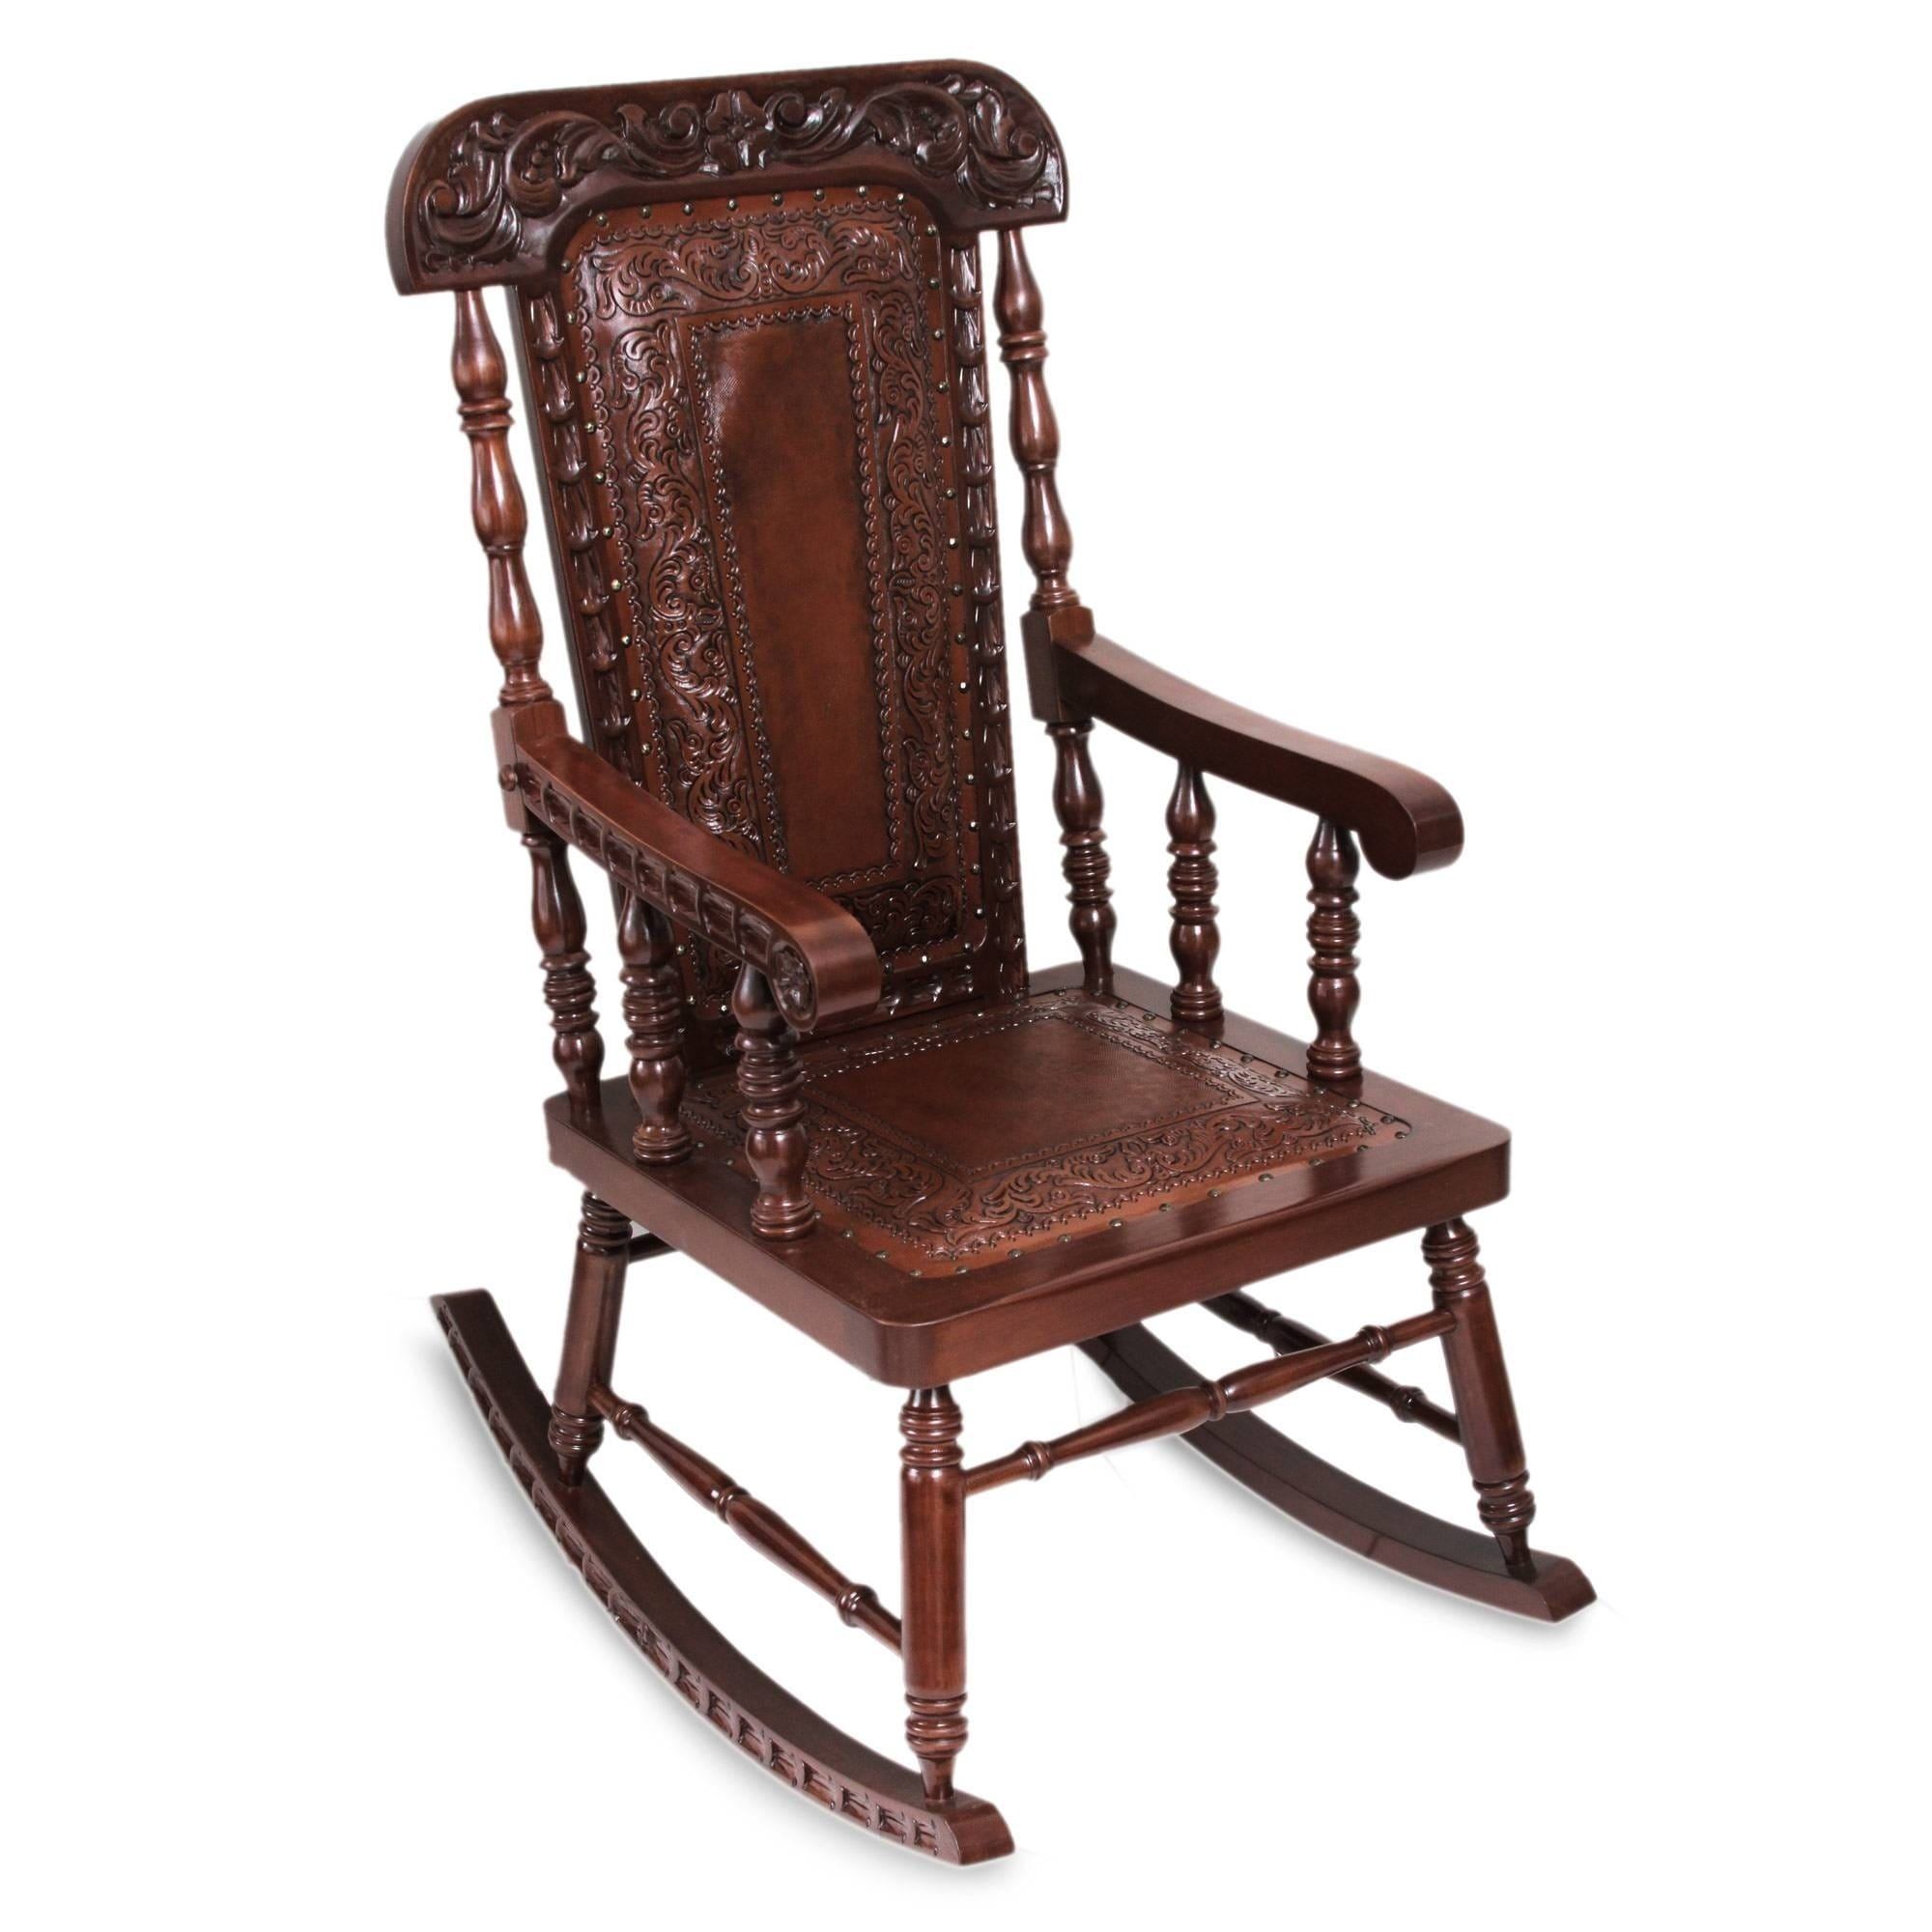 Enjoyable Nobility Cedar And Leather Rocking Chair Machost Co Dining Chair Design Ideas Machostcouk